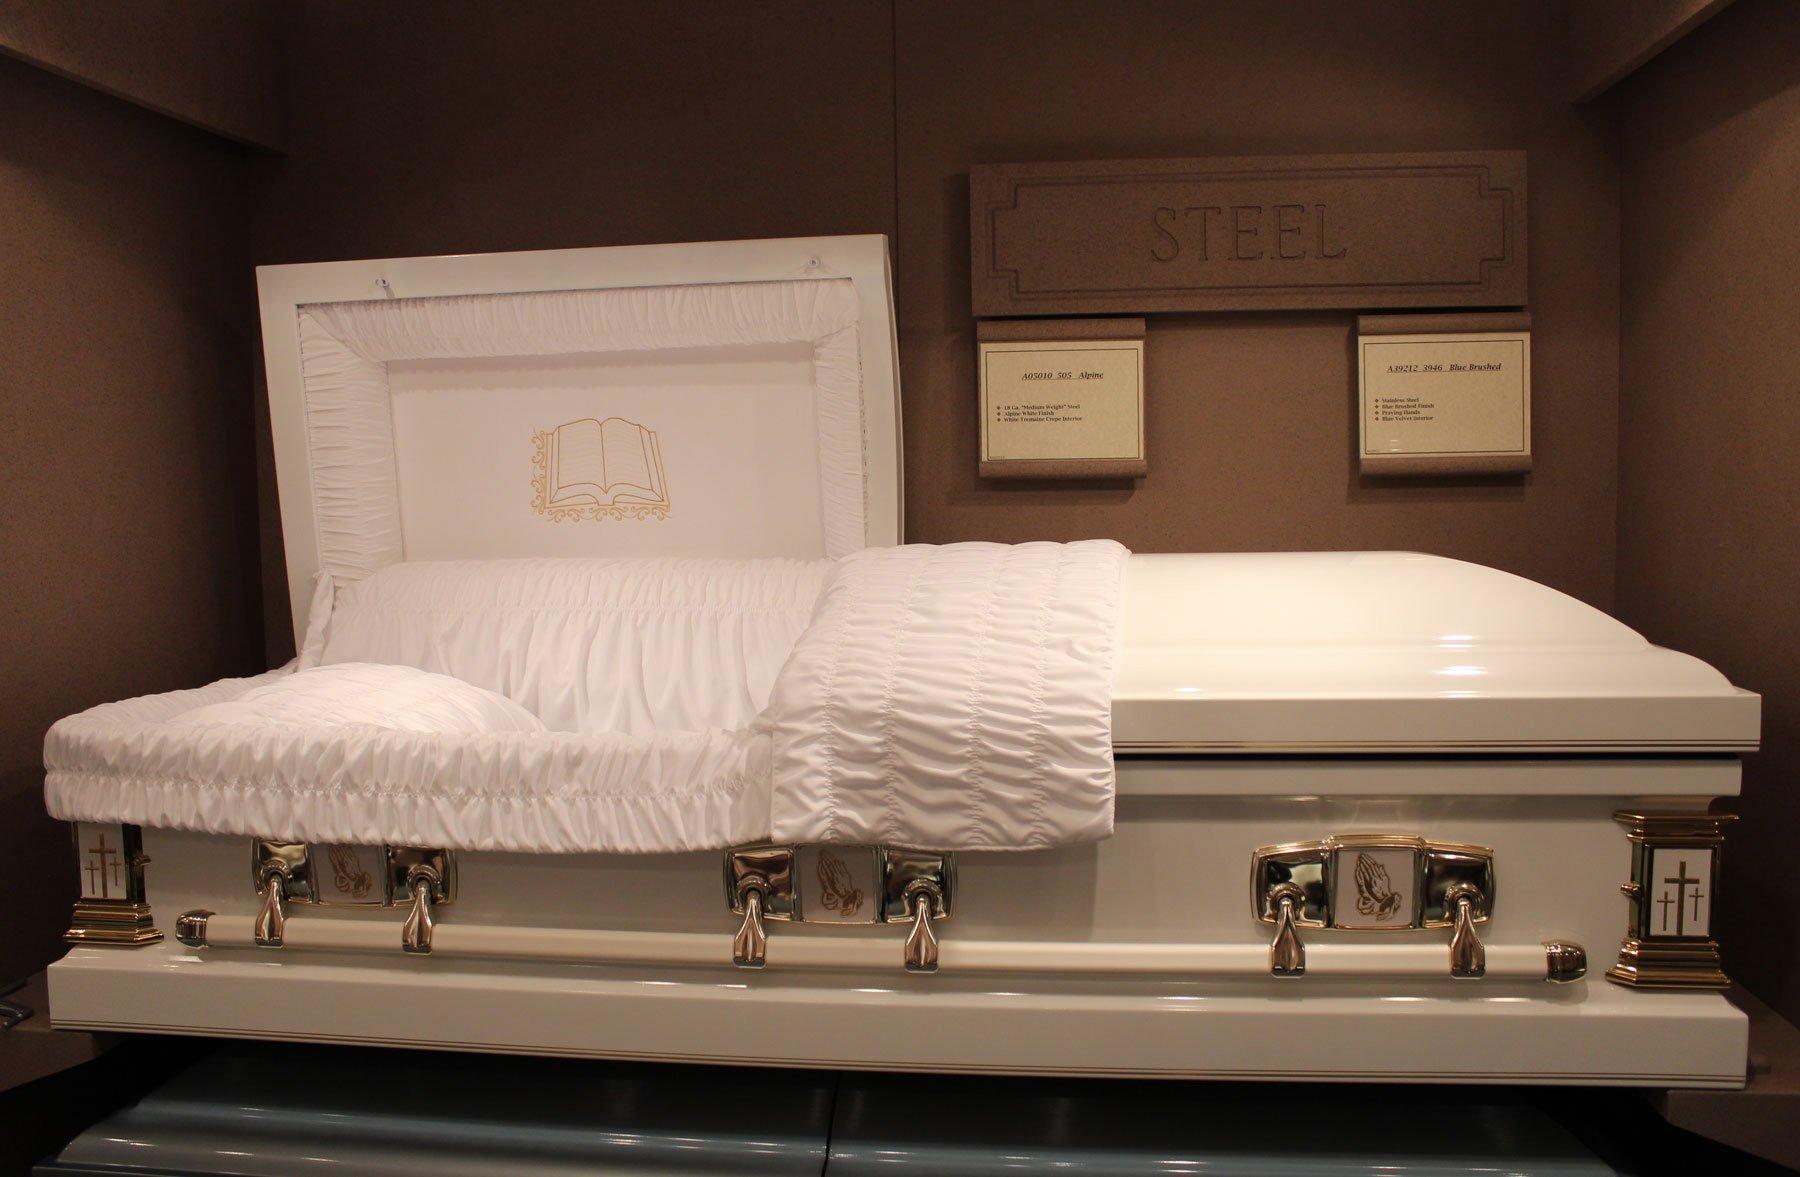 Kasandra perkins open casket pictures Miley Cyrus - Wikipedia